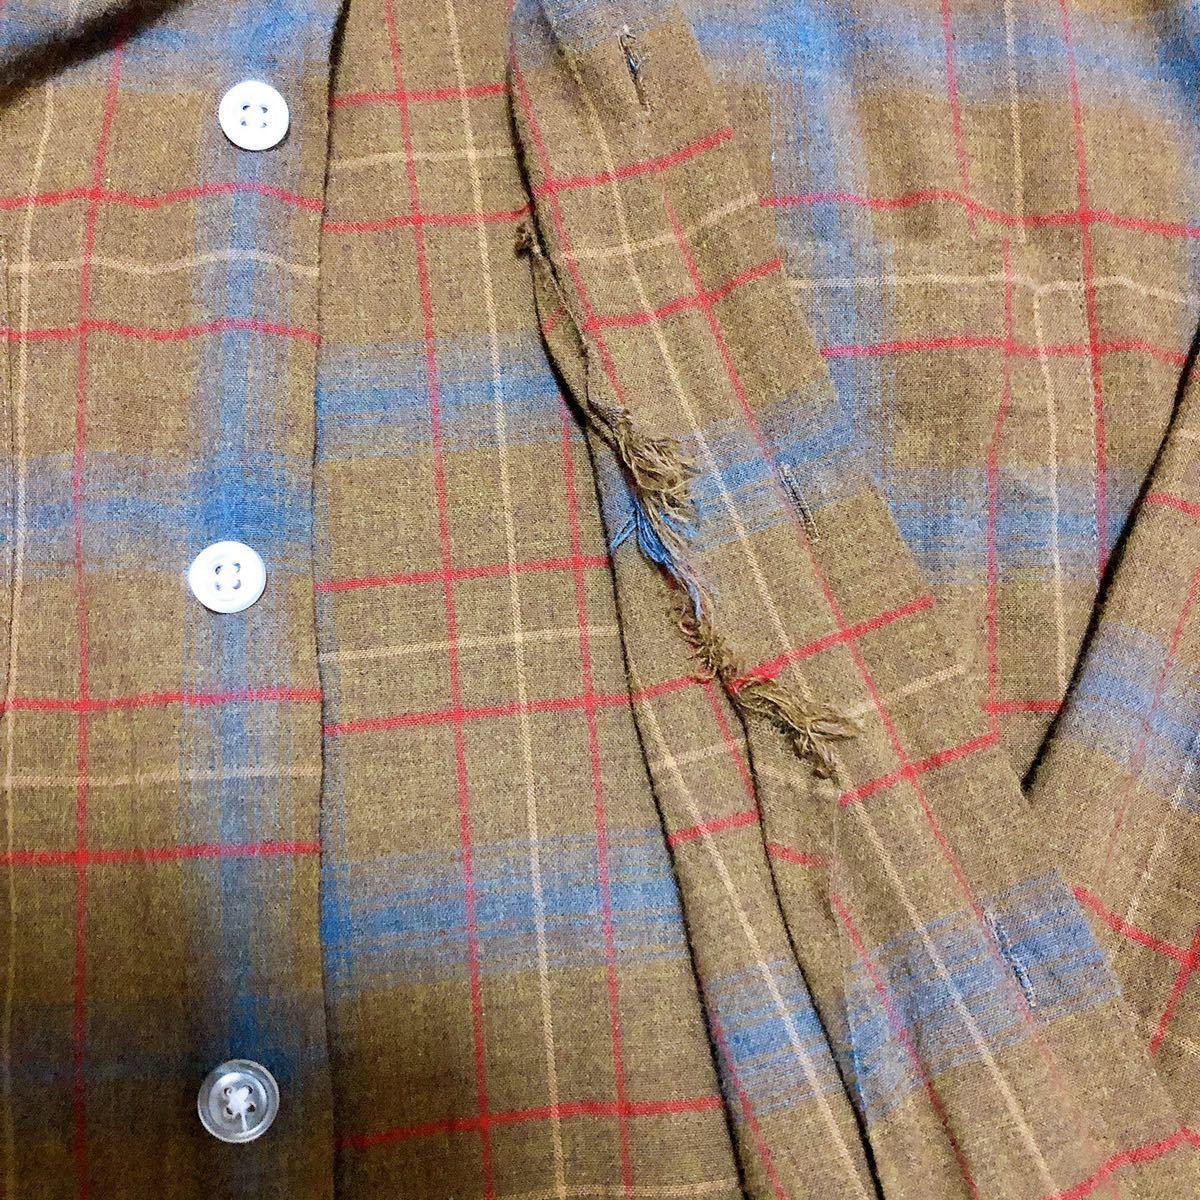 Vintage レーヨン チェックシャツ XL 長袖シャツ チェックシャツ ビンテージ タウンクラフト_画像4